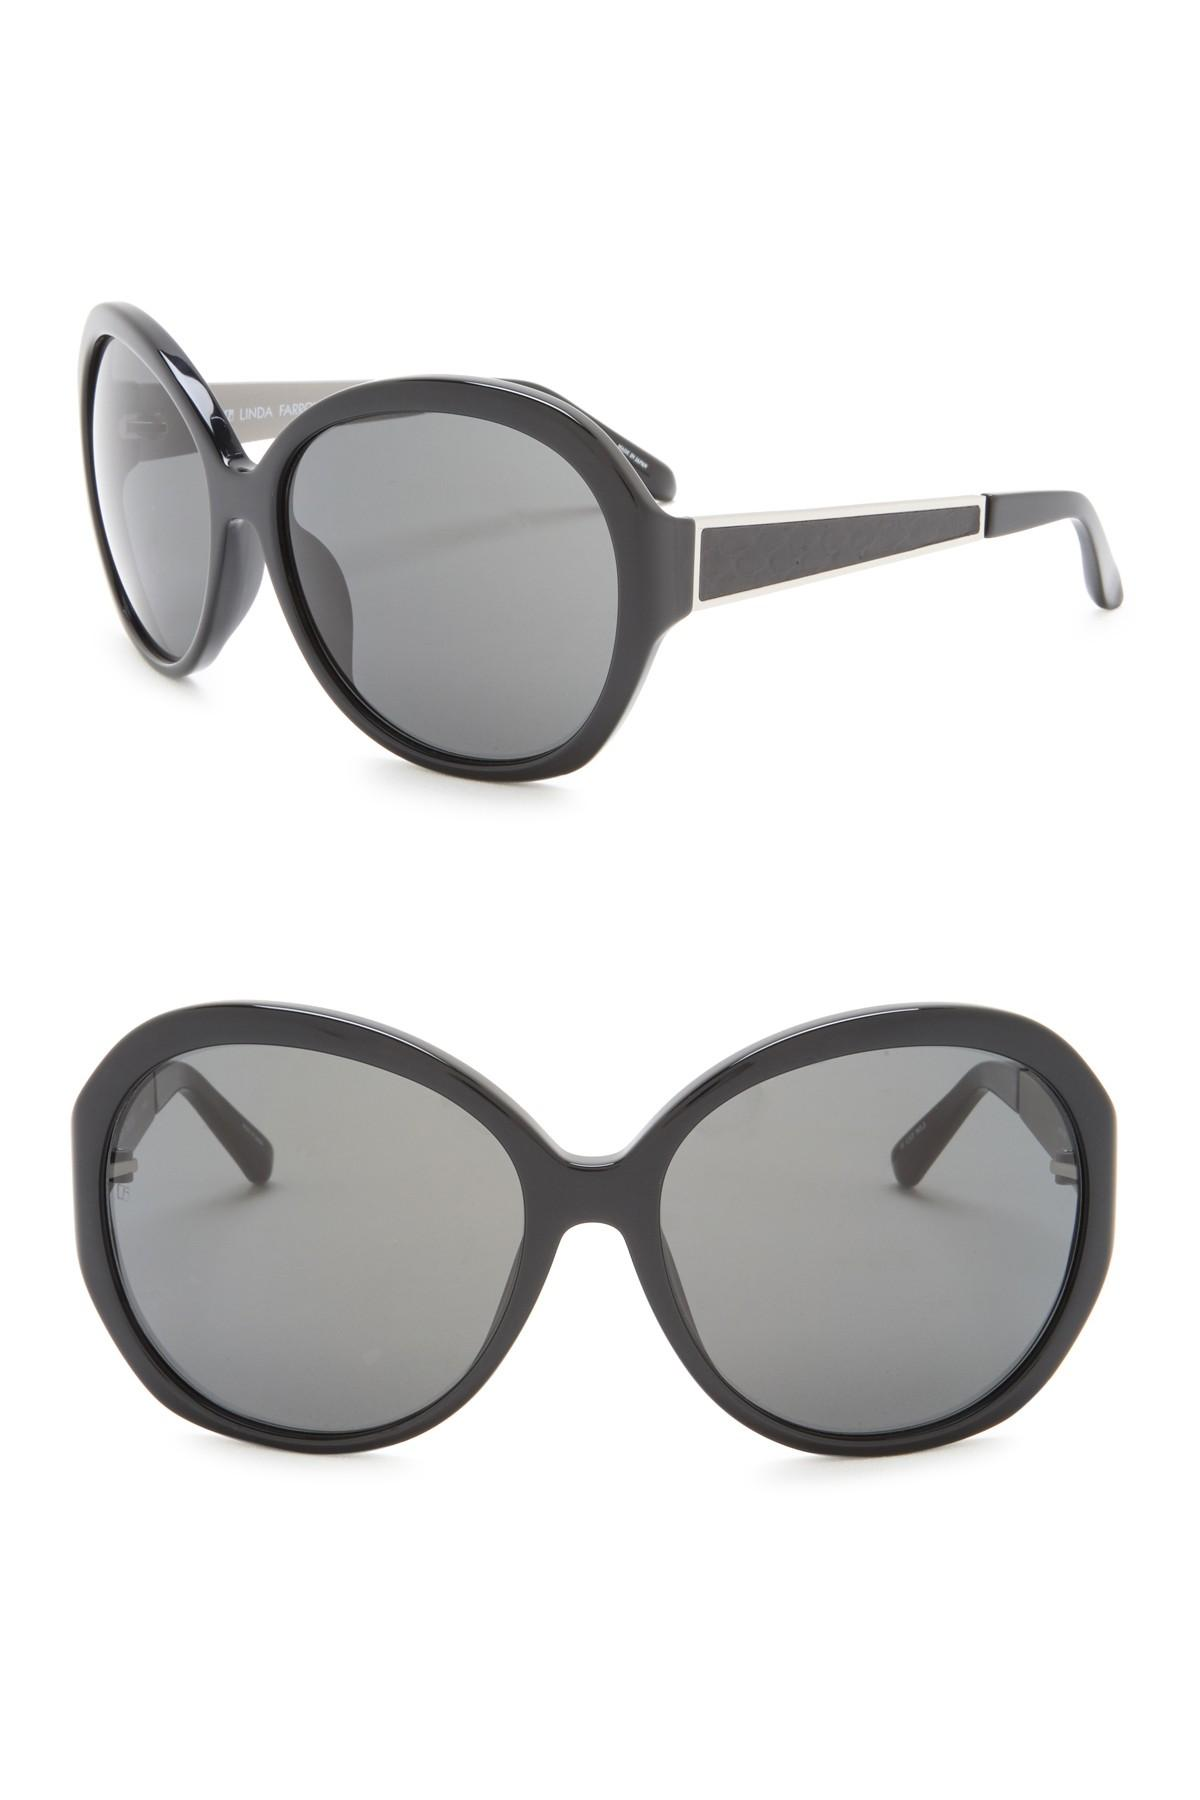 21bfcc0cfa1 Lyst - Linda Farrow 61mm Snake Butterfly Sunglasses in Gray